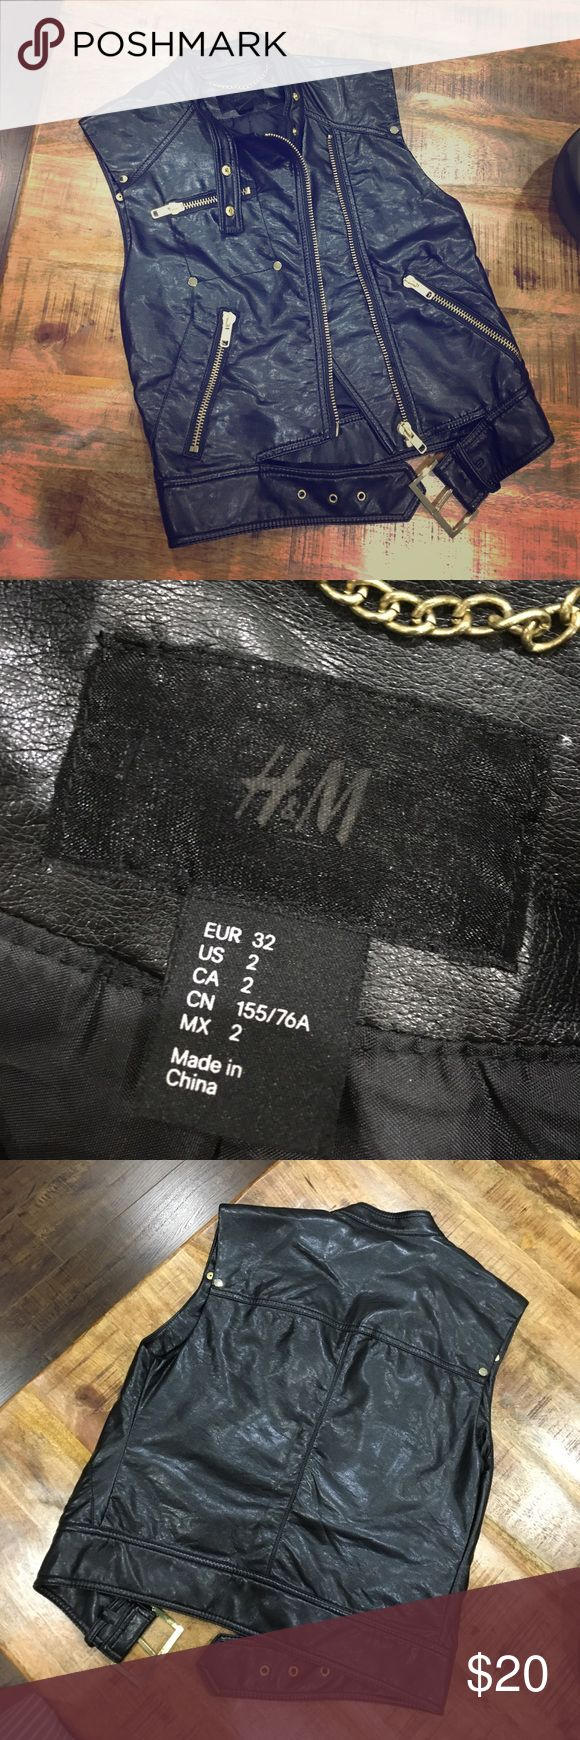 H&M Black leather vest ** NEVER BEEN WORN** Black leather, gold detail. Zip up and belt buckle towards the bottom. H&M Jackets & Coats Vests